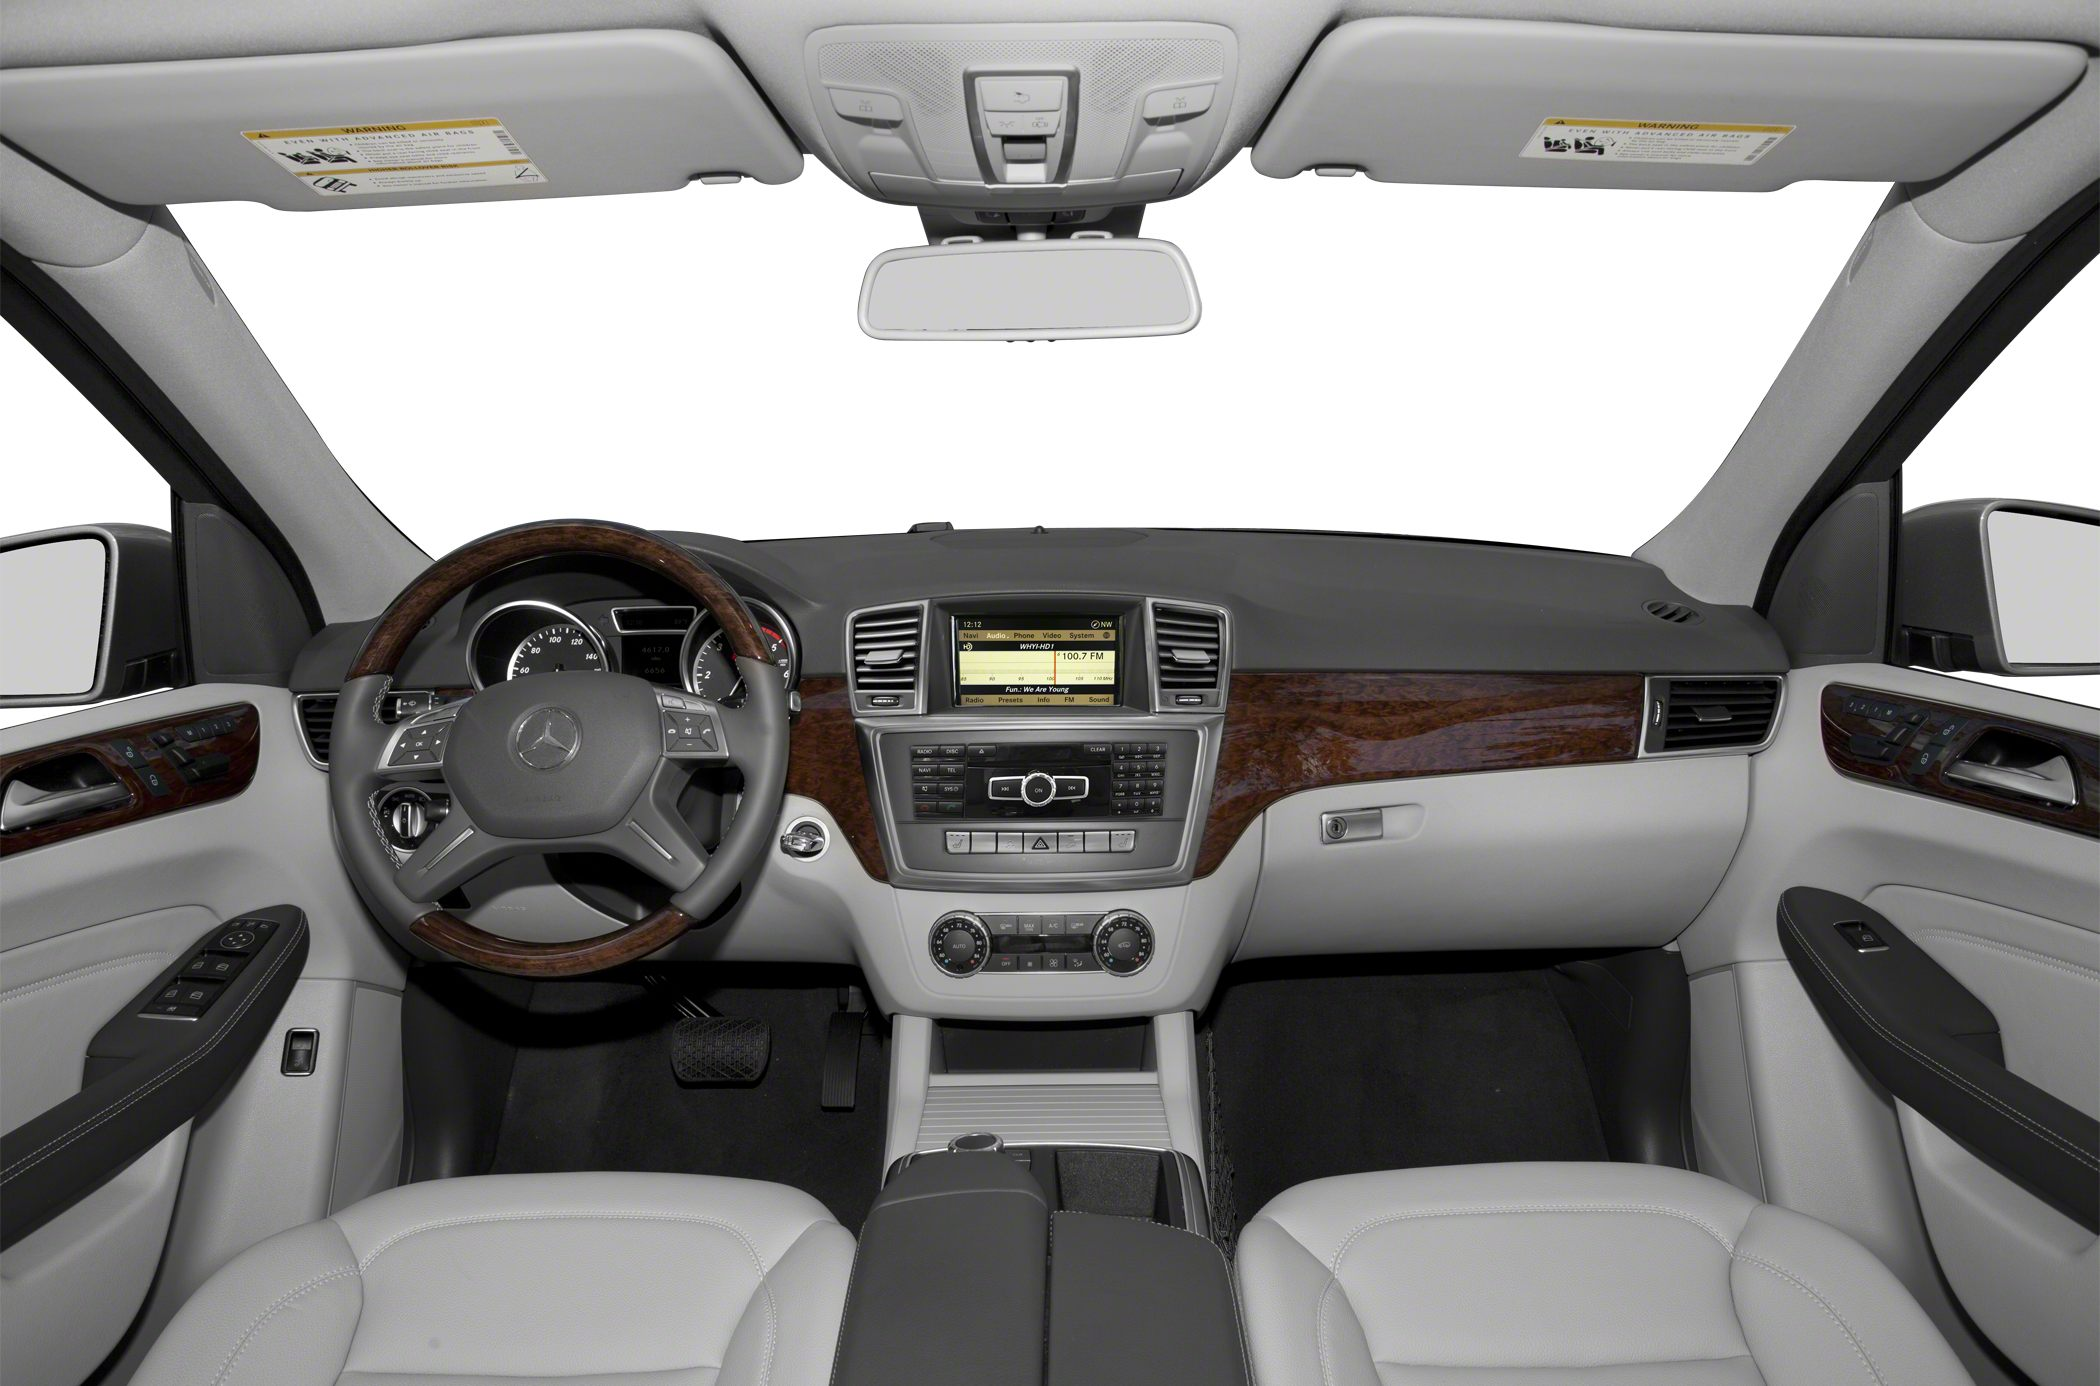 2014 Mercedes-Benz ML350 BlueTEC Pictures & Photos - CarsDirect